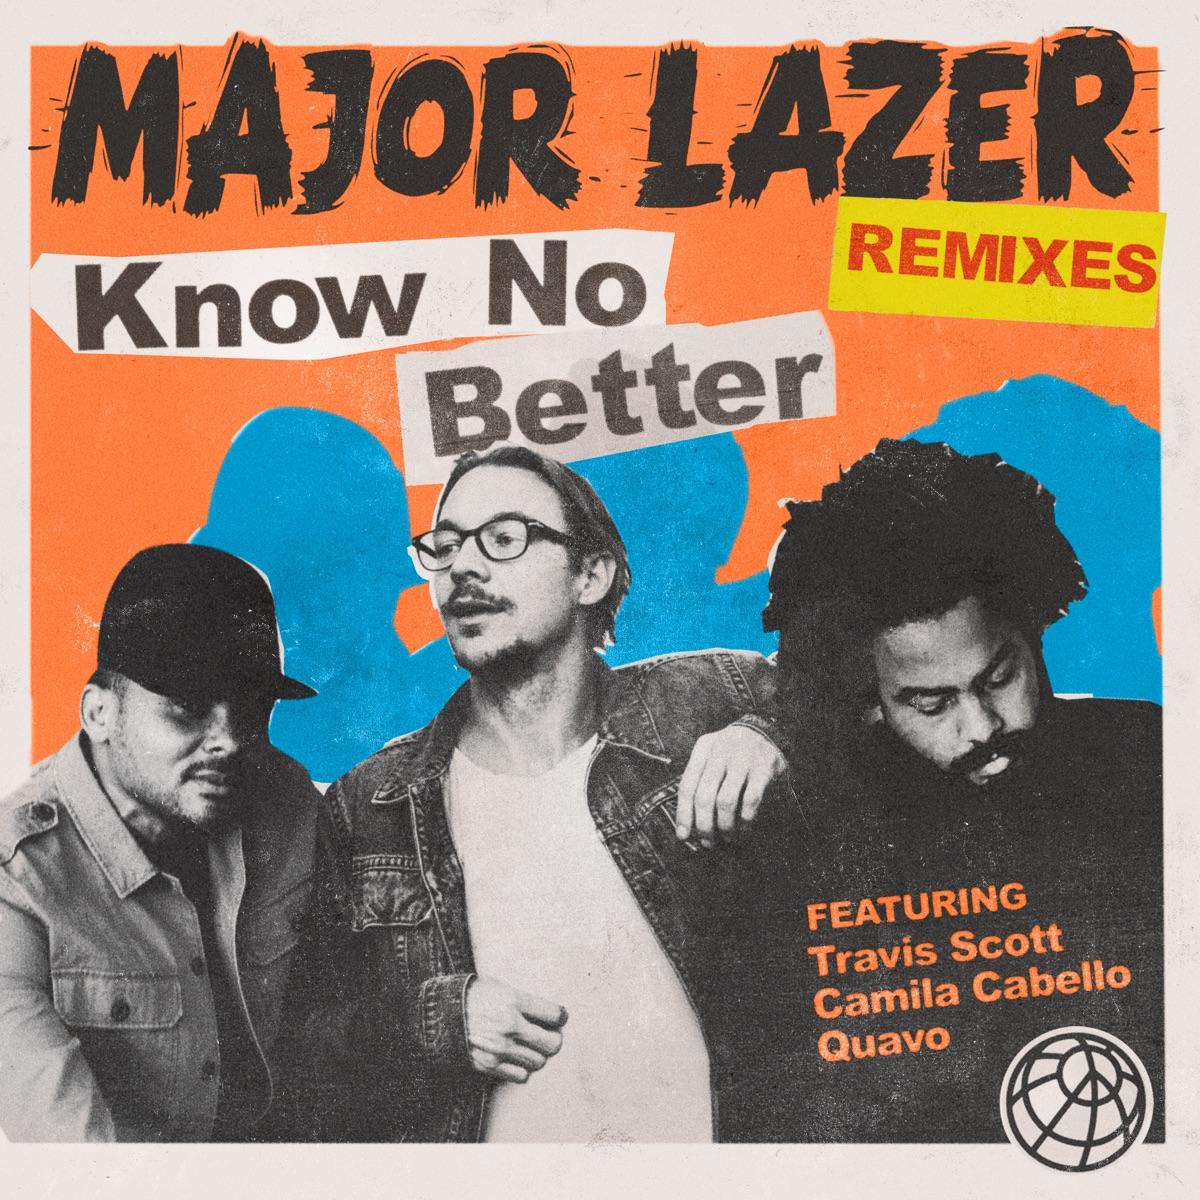 Know No Better feat Travis Scott Camila Cabello  Quavo Remixes Major Lazer CD cover